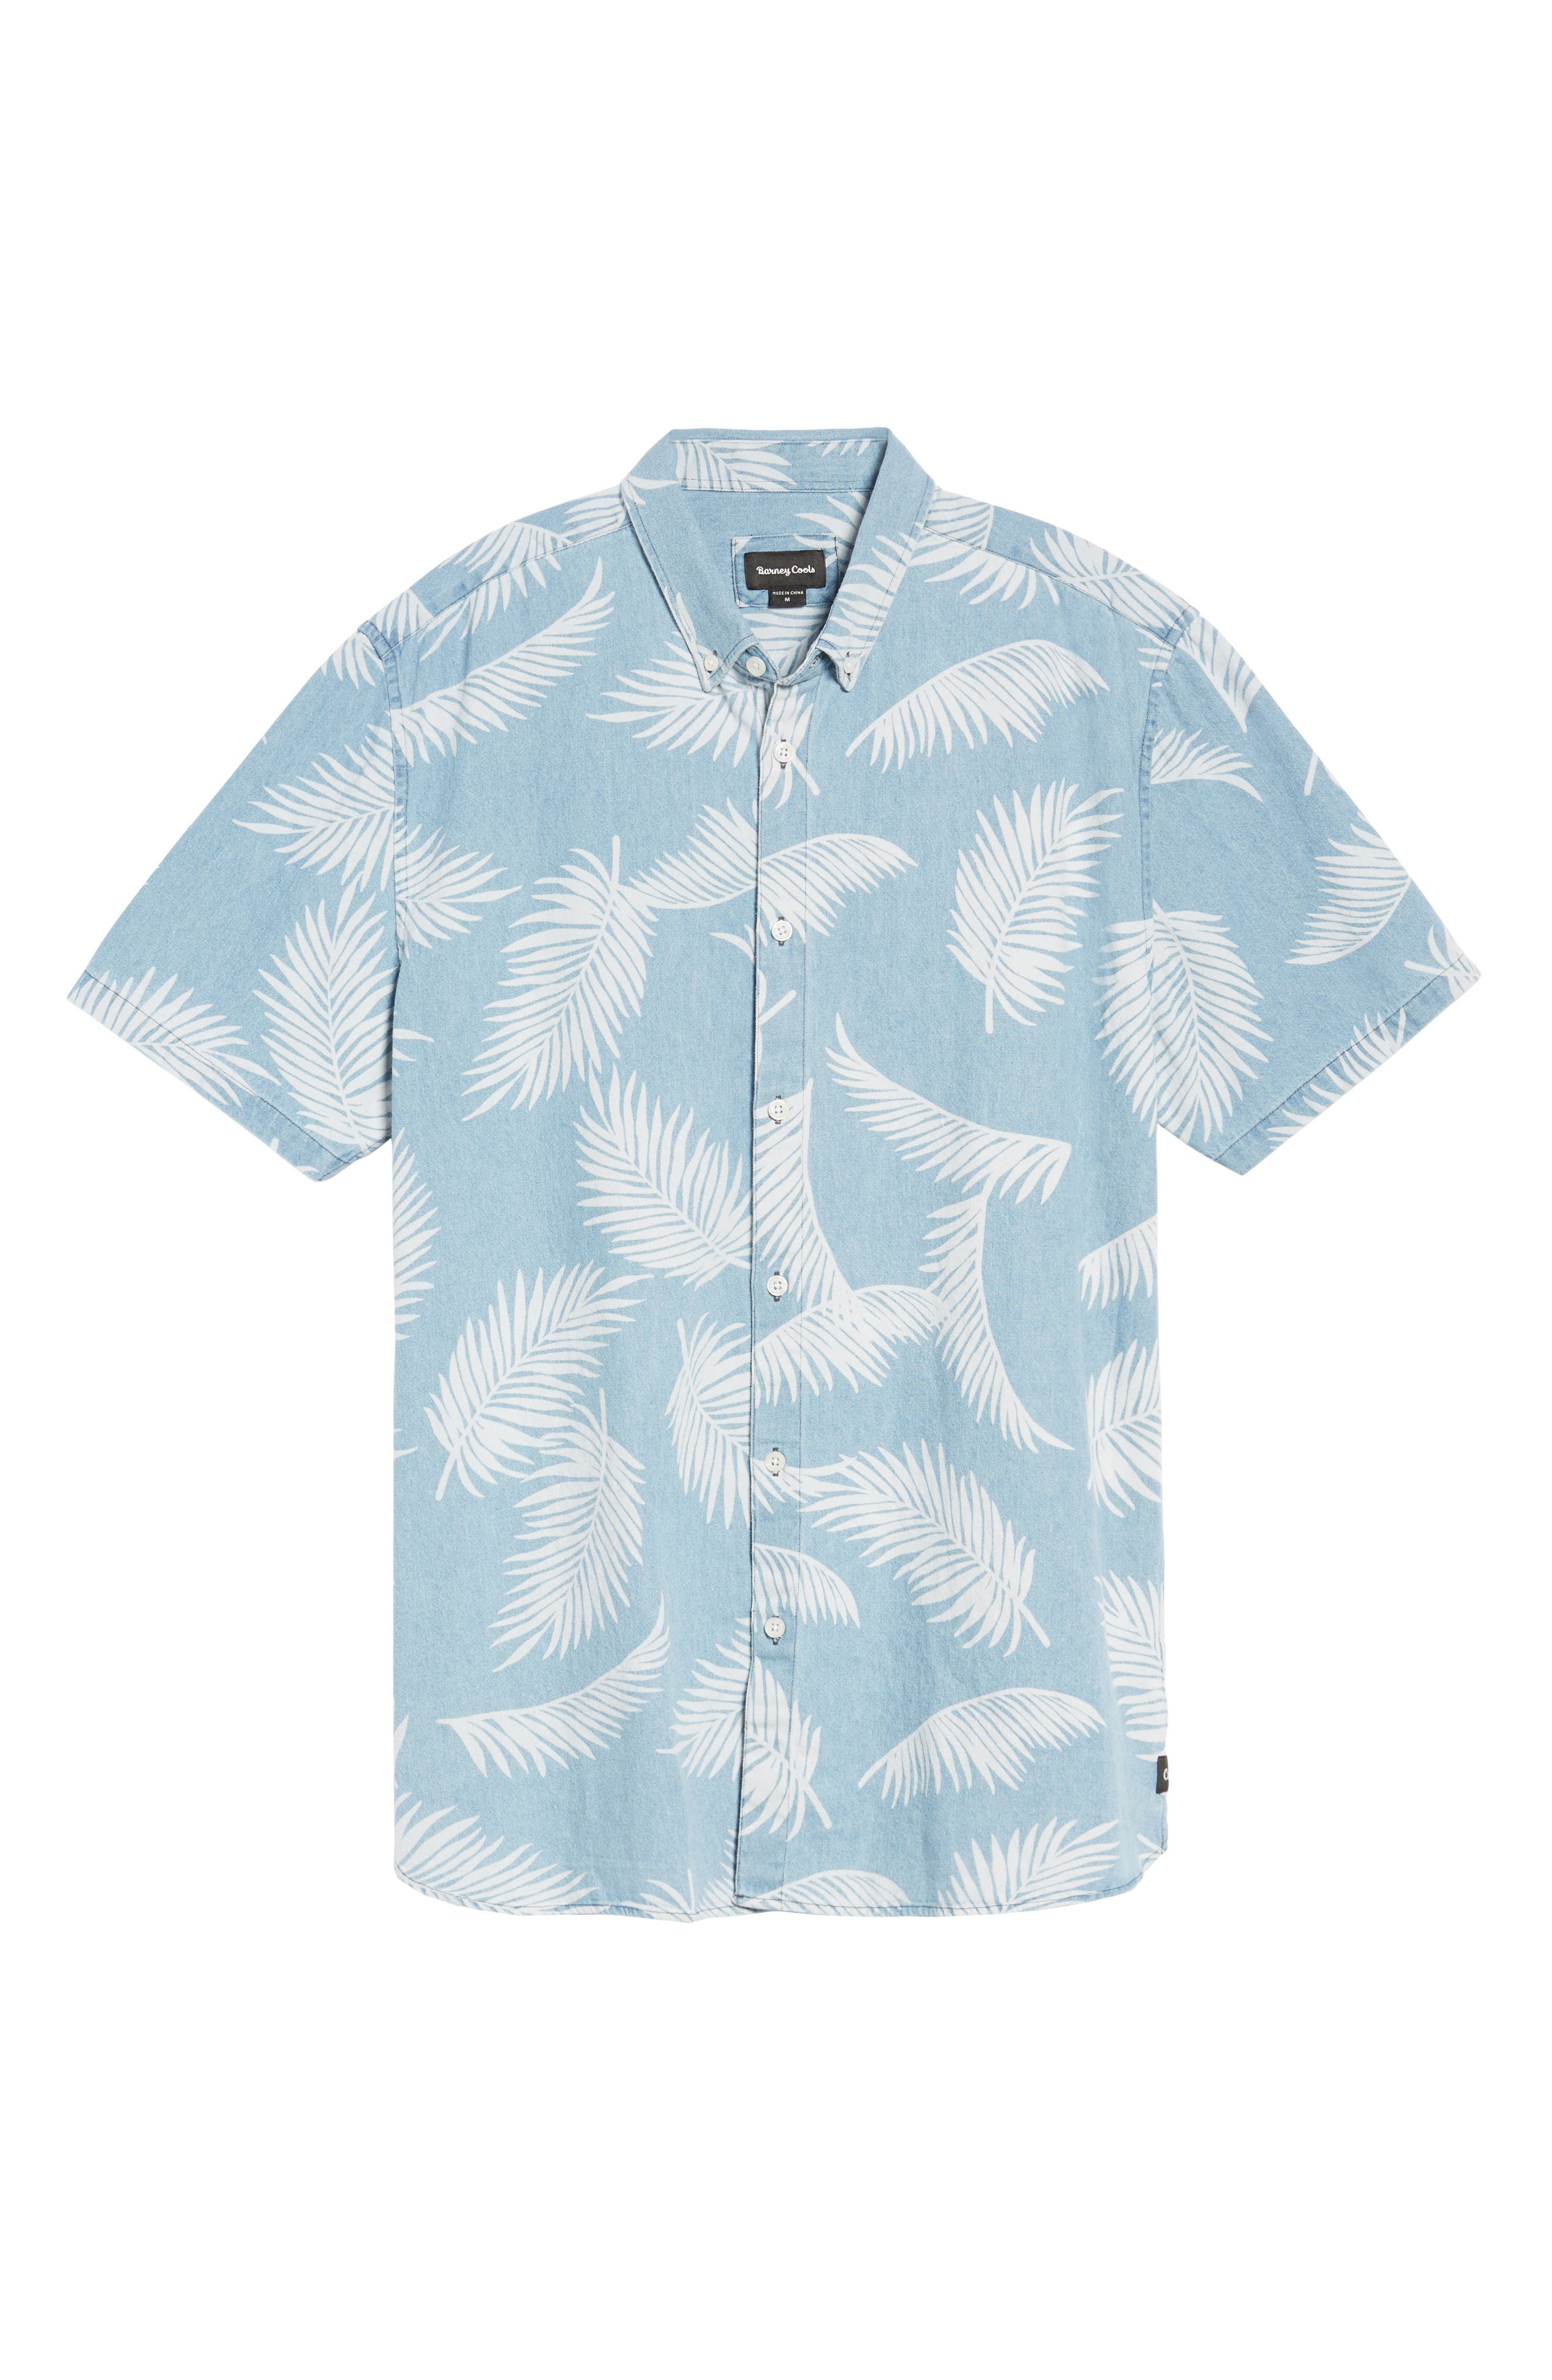 Bahamas Shirt,                             Alternate thumbnail 6, color,                             423